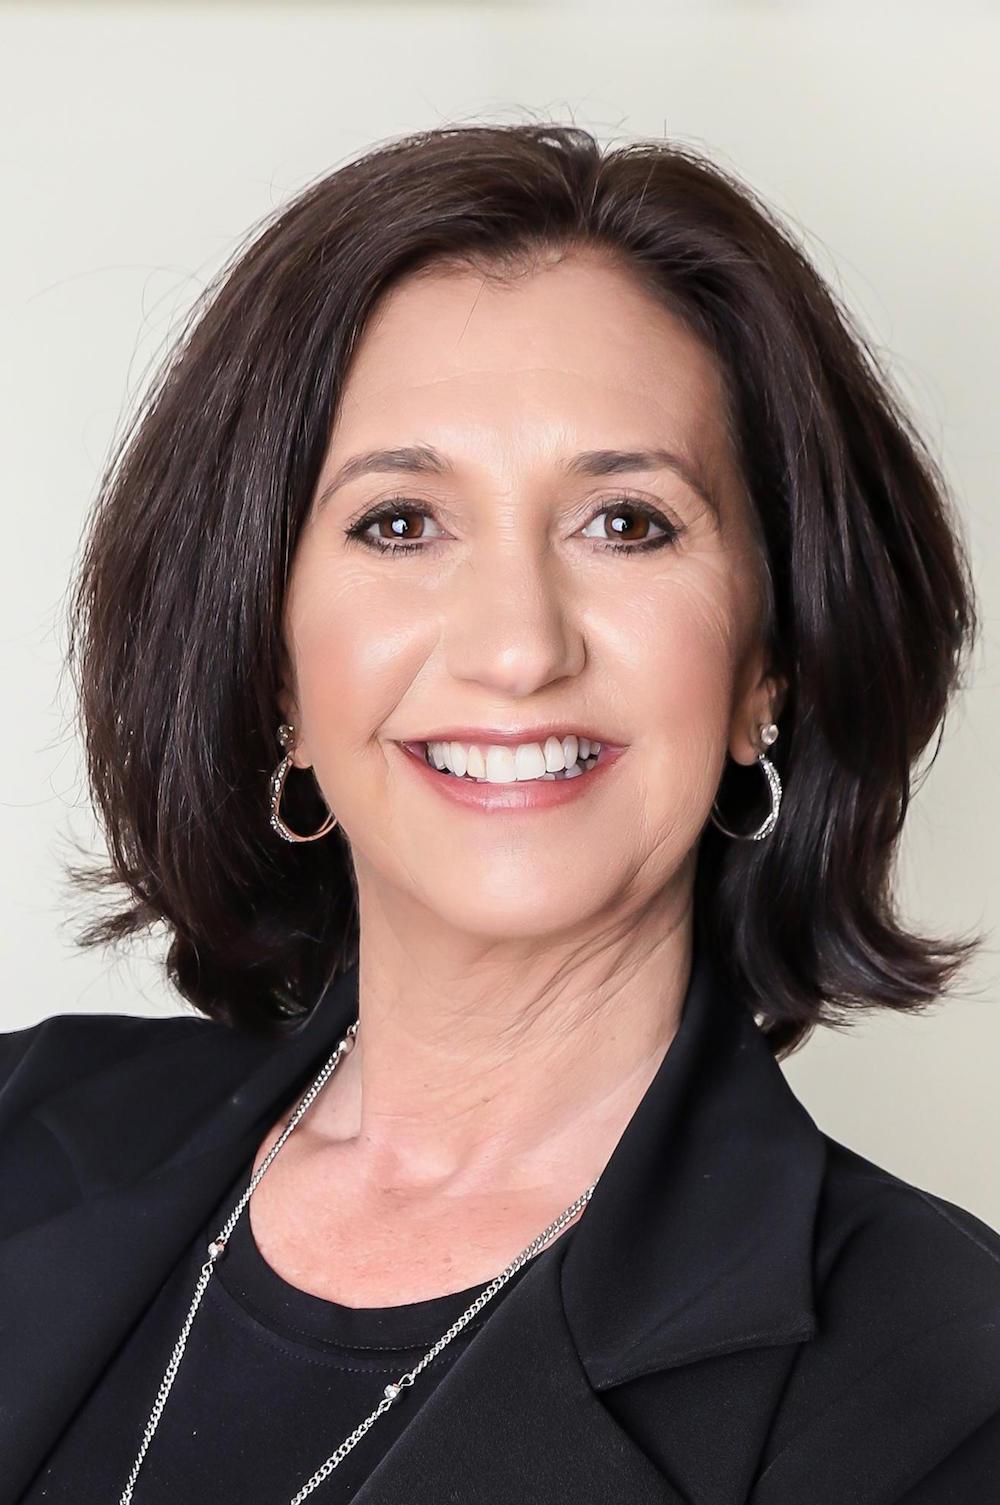 Michele Nesbihal